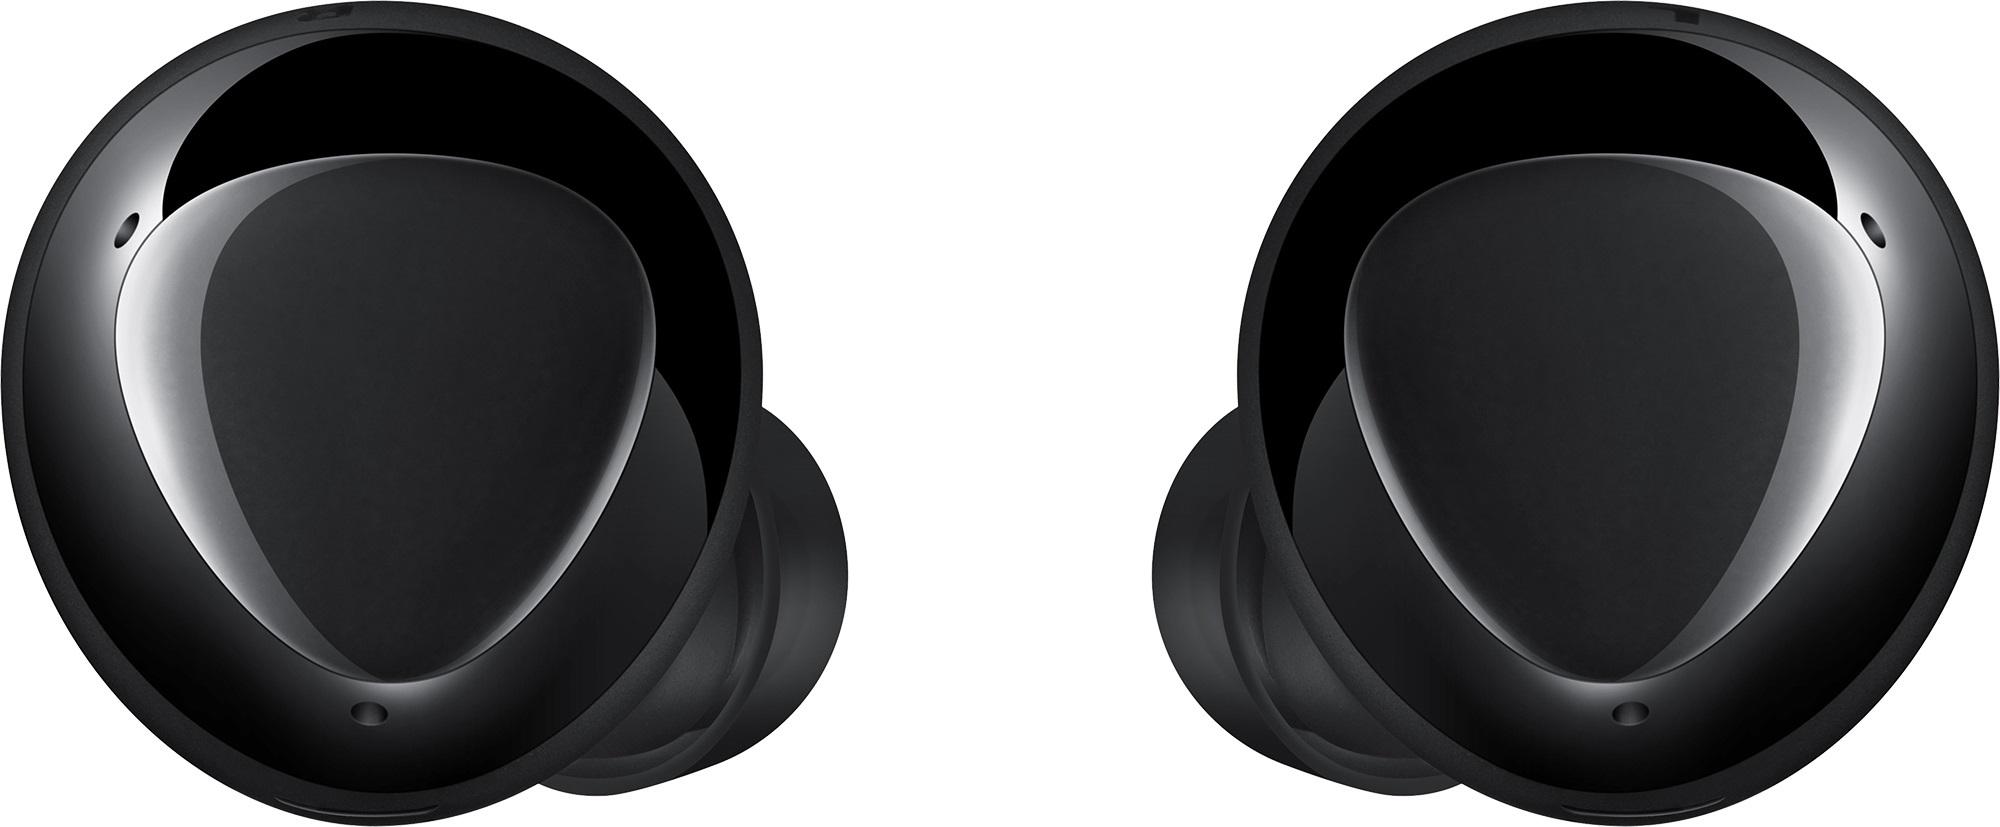 Galaxy Buds+ - Ecouteurs True Wireless - Noir